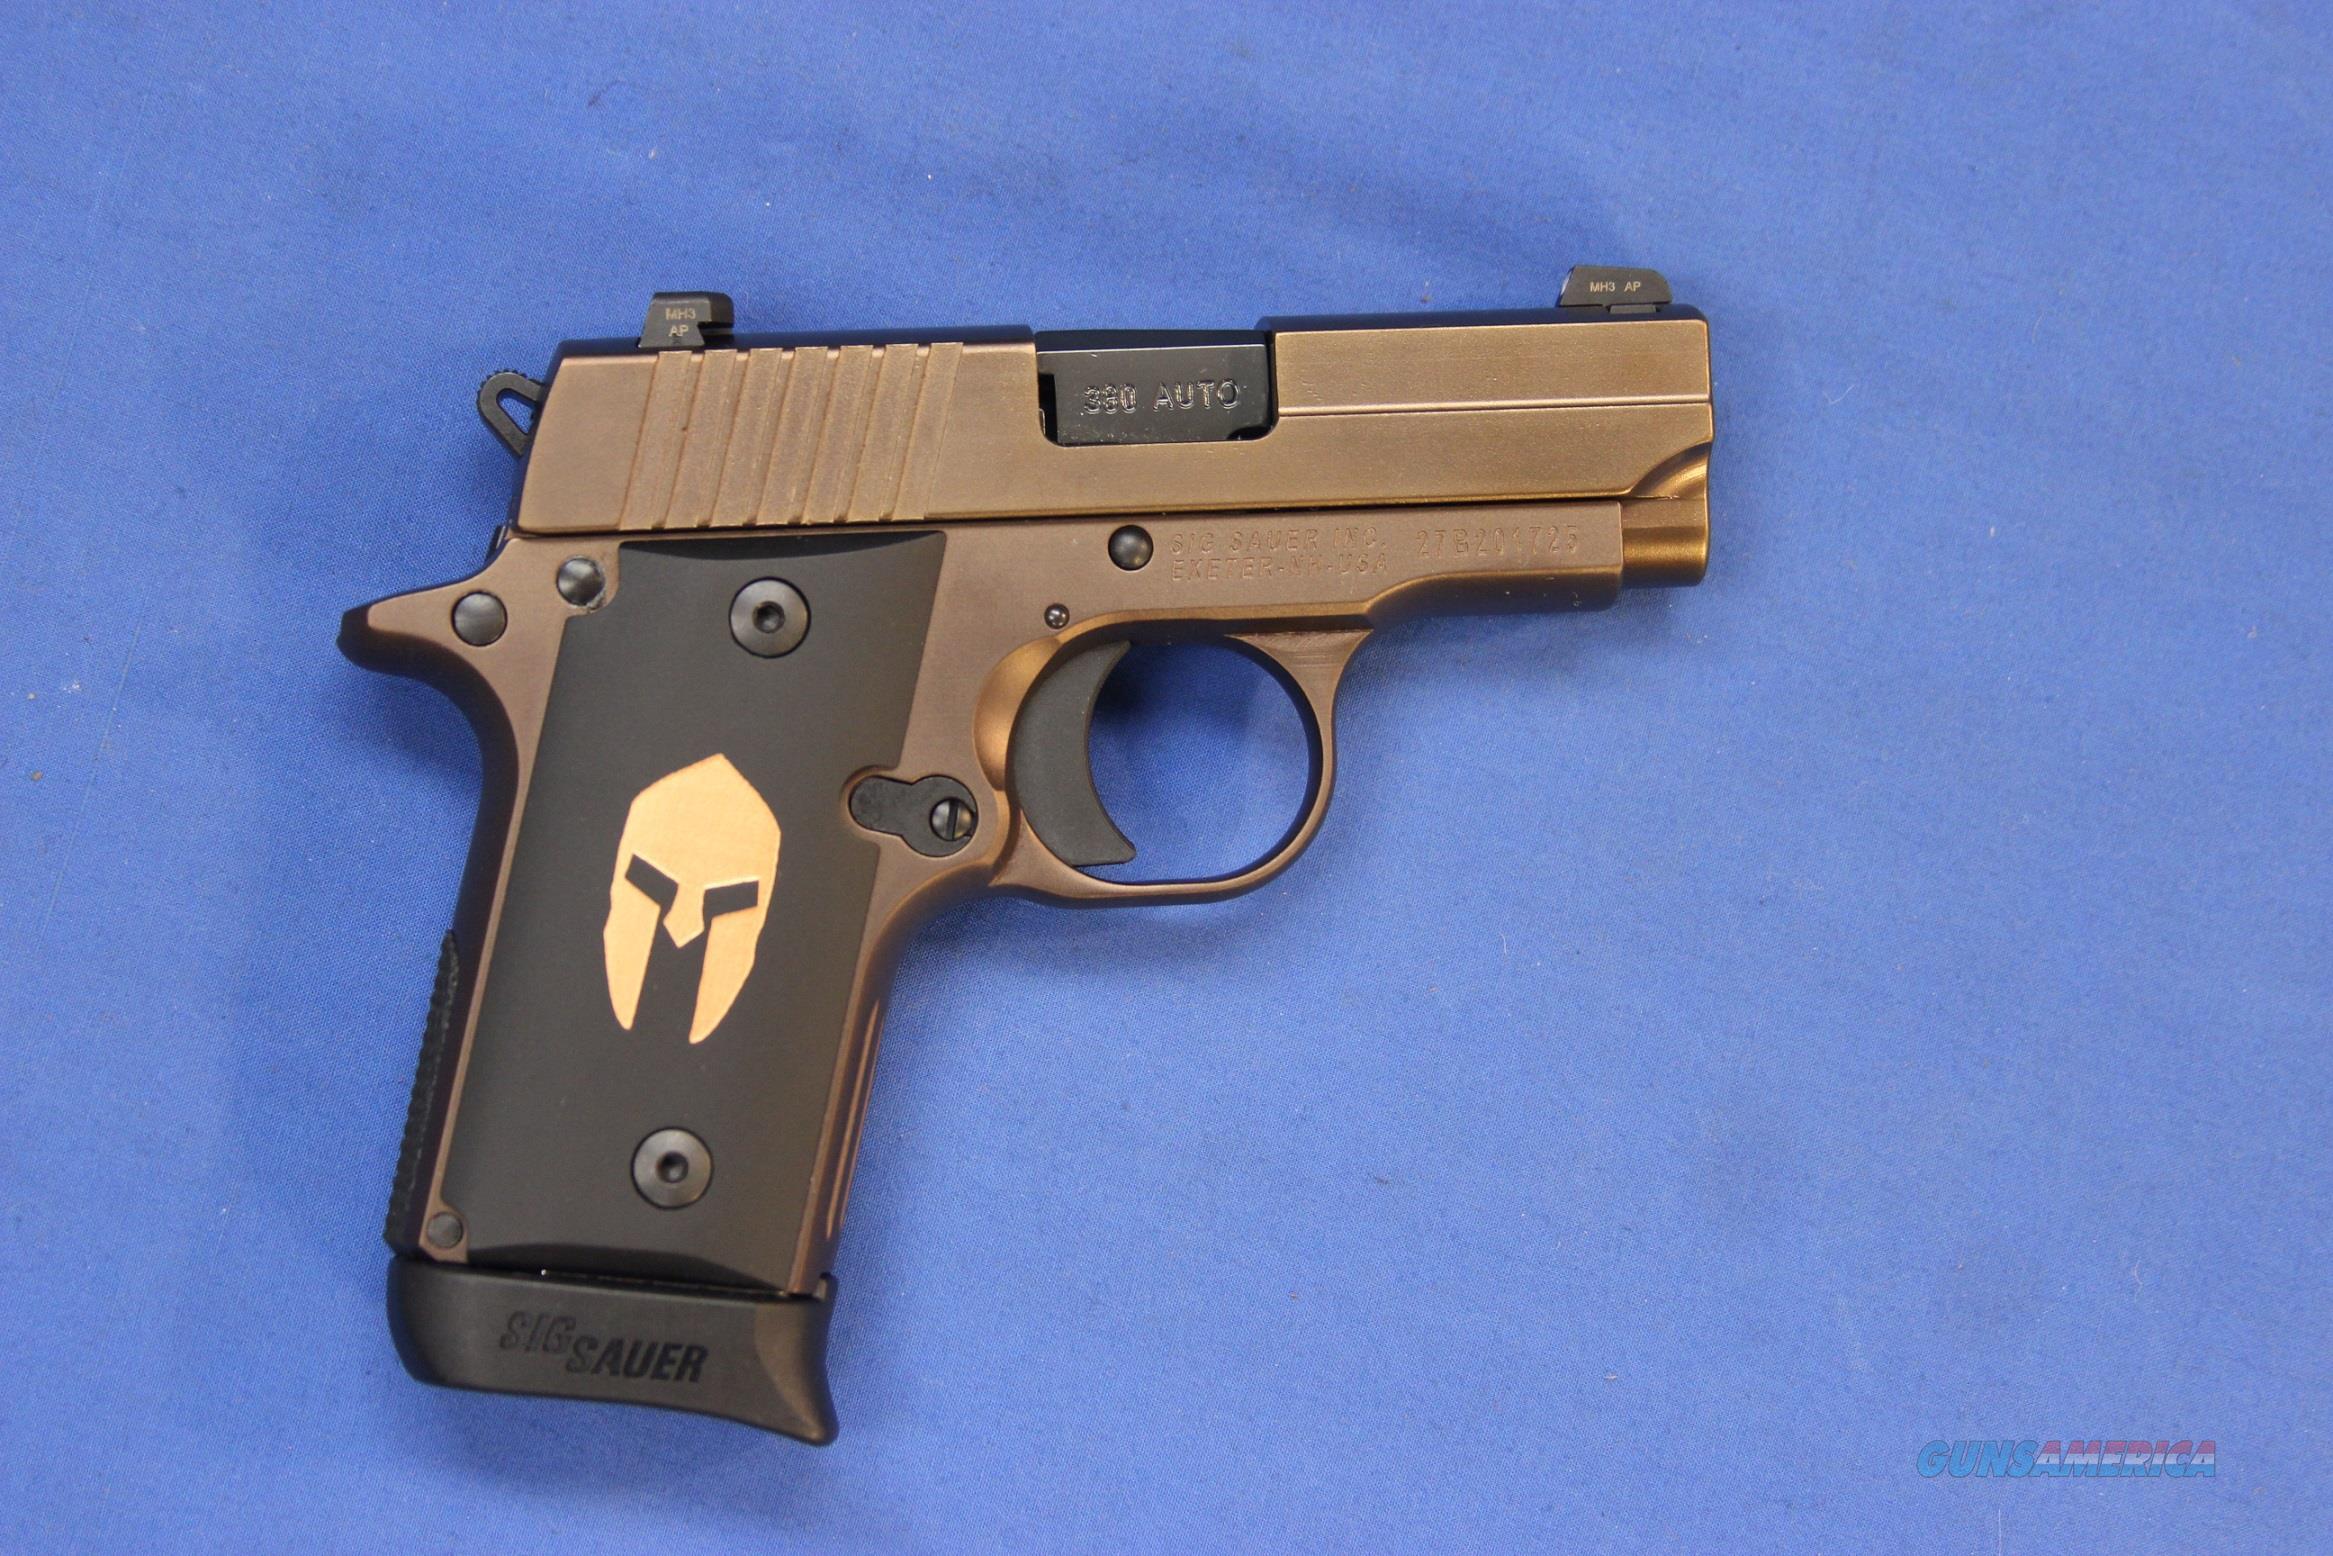 SIG SAUER P238 SPARTAN .380 ACP - NEW!  Guns > Pistols > Sig - Sauer/Sigarms Pistols > P238